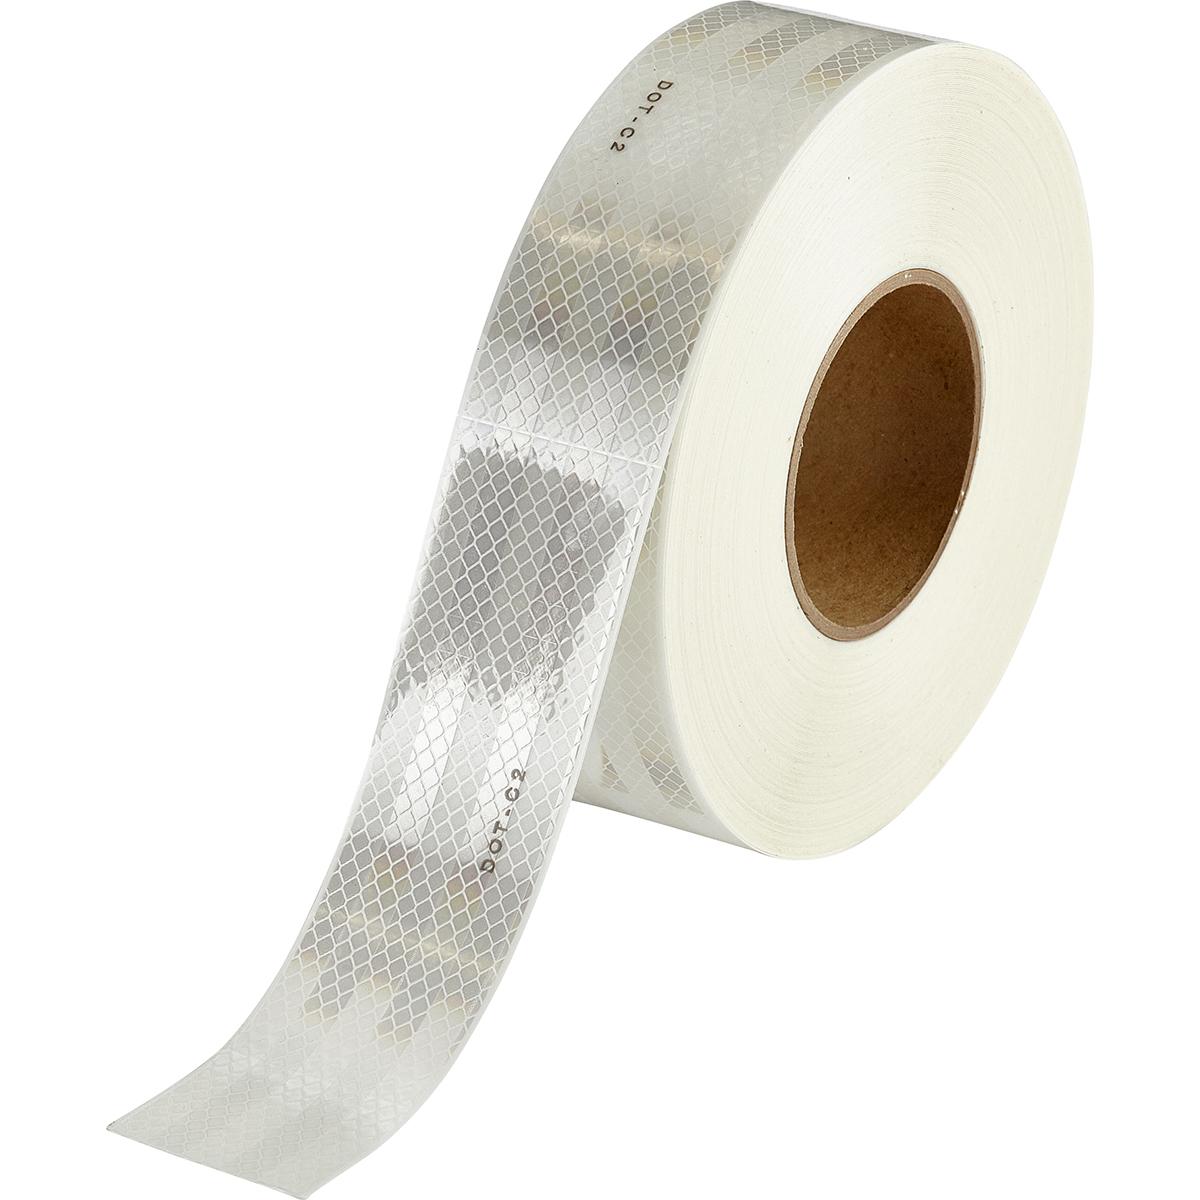 Brady® 76438 Vehicle Conspicuity Tape Kit, DOT-C2 Red/White, B-752 Sheeting